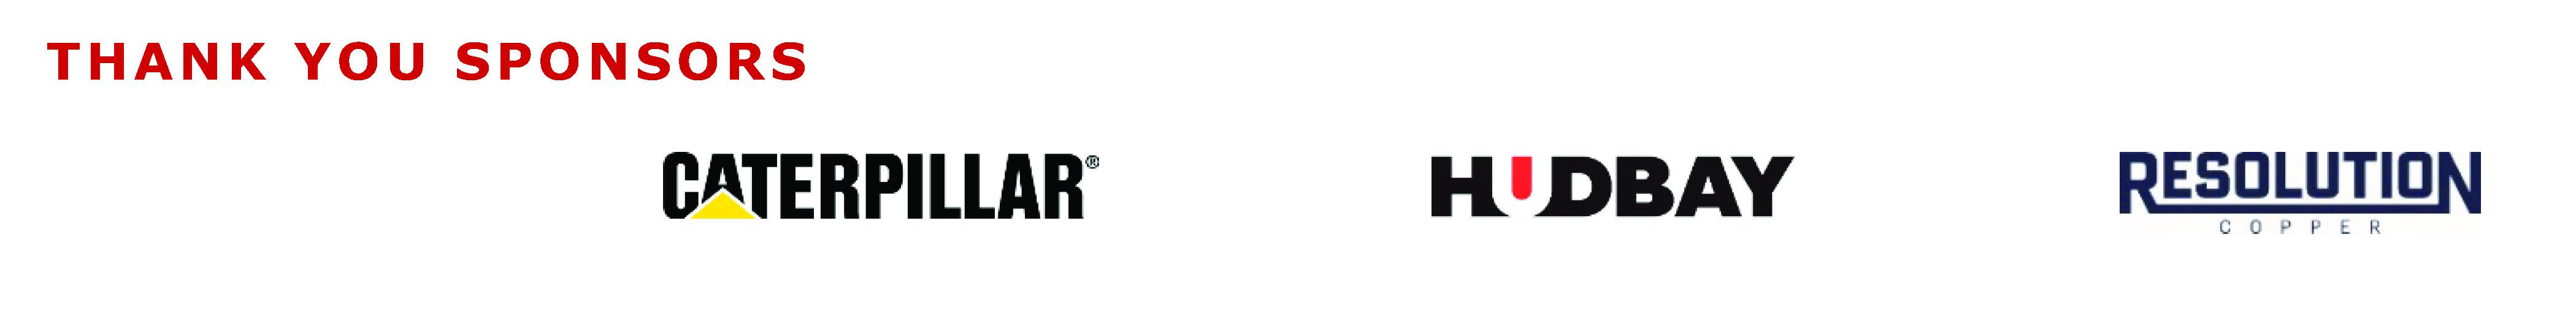 Image of Mining Law Summit 2018 Sponsors logos